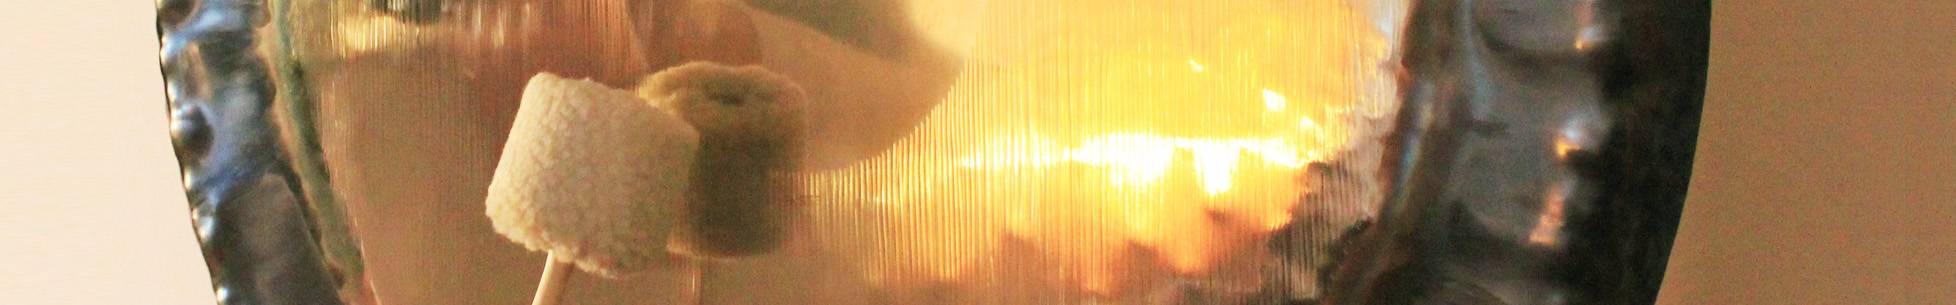 gongmeditation gong